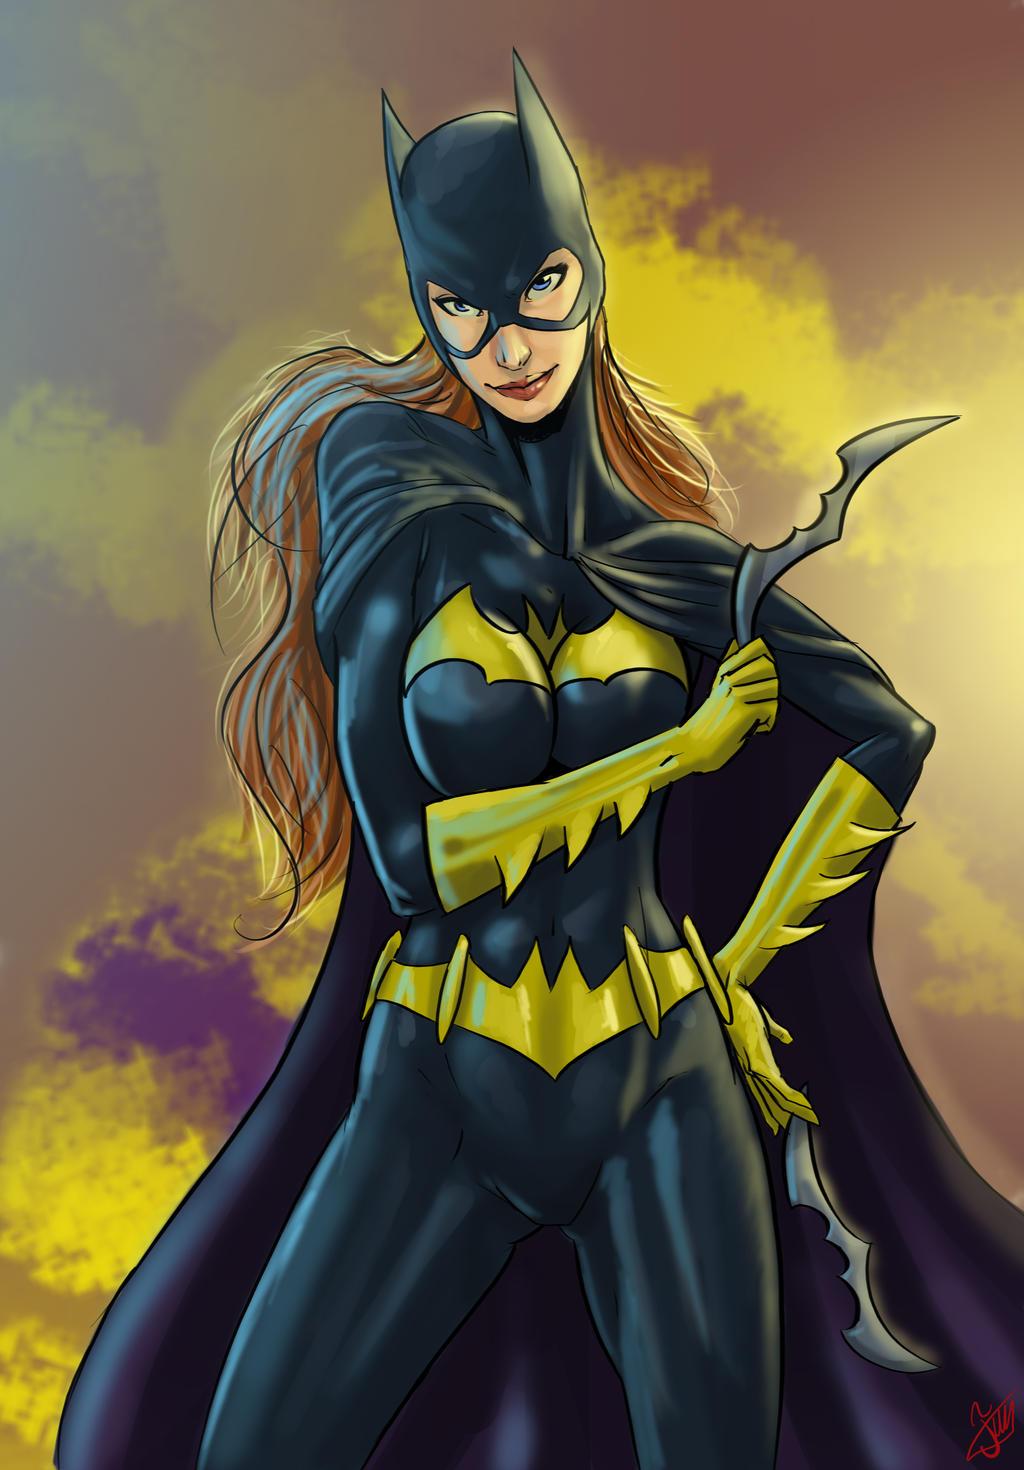 Batgirl by G-manbg